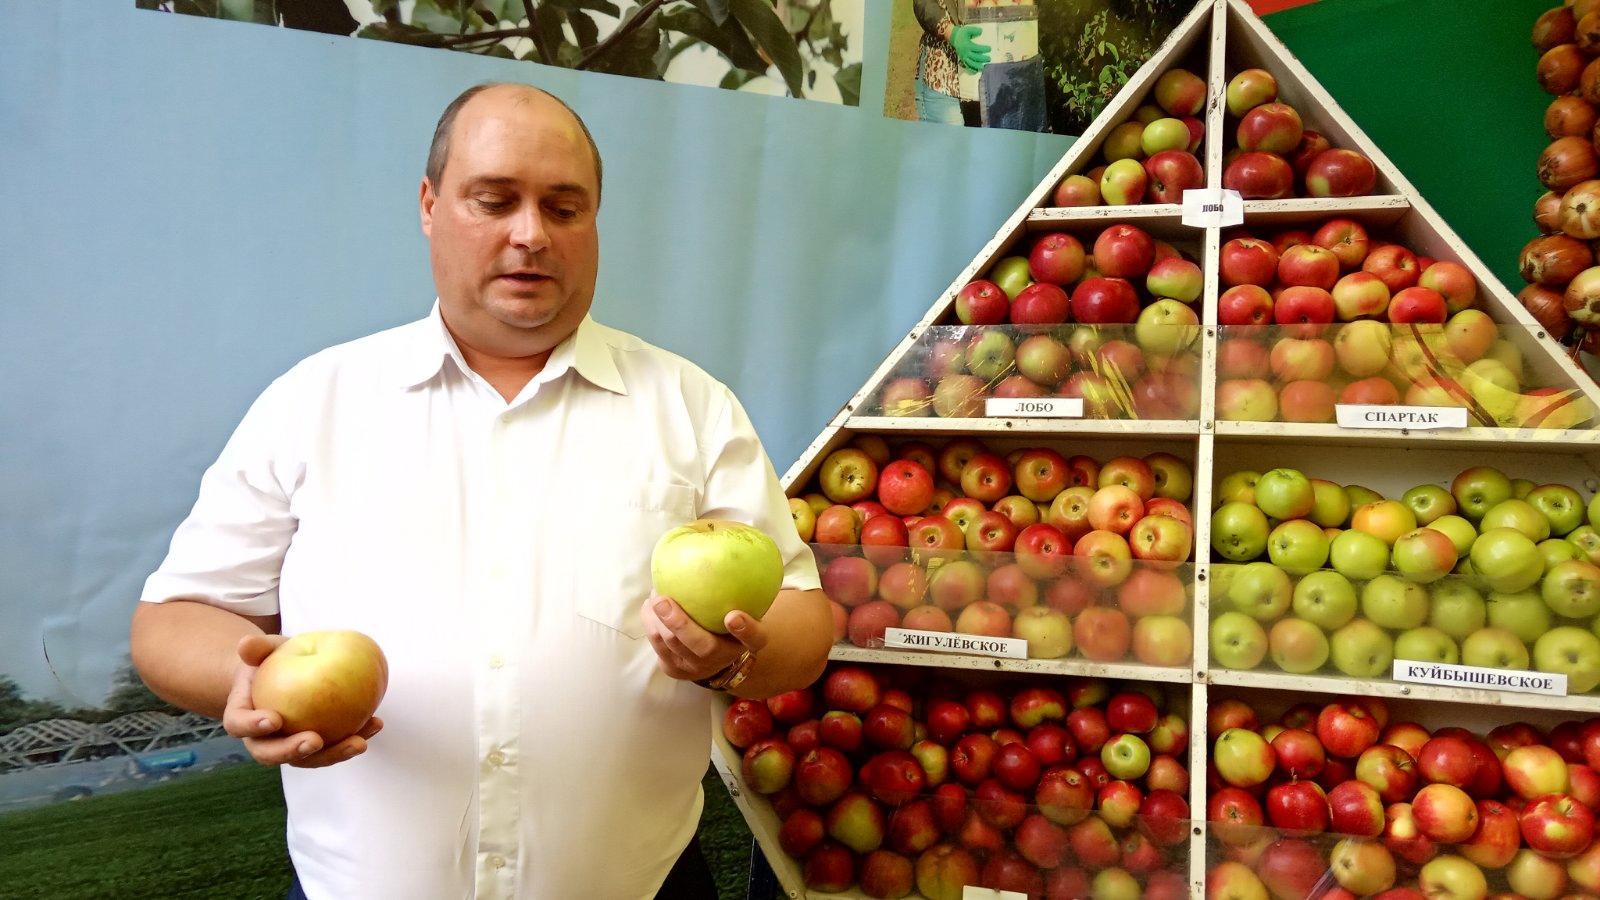 Яблоки весом в треть килограмма! Самарцев удивили плодами-гигантами